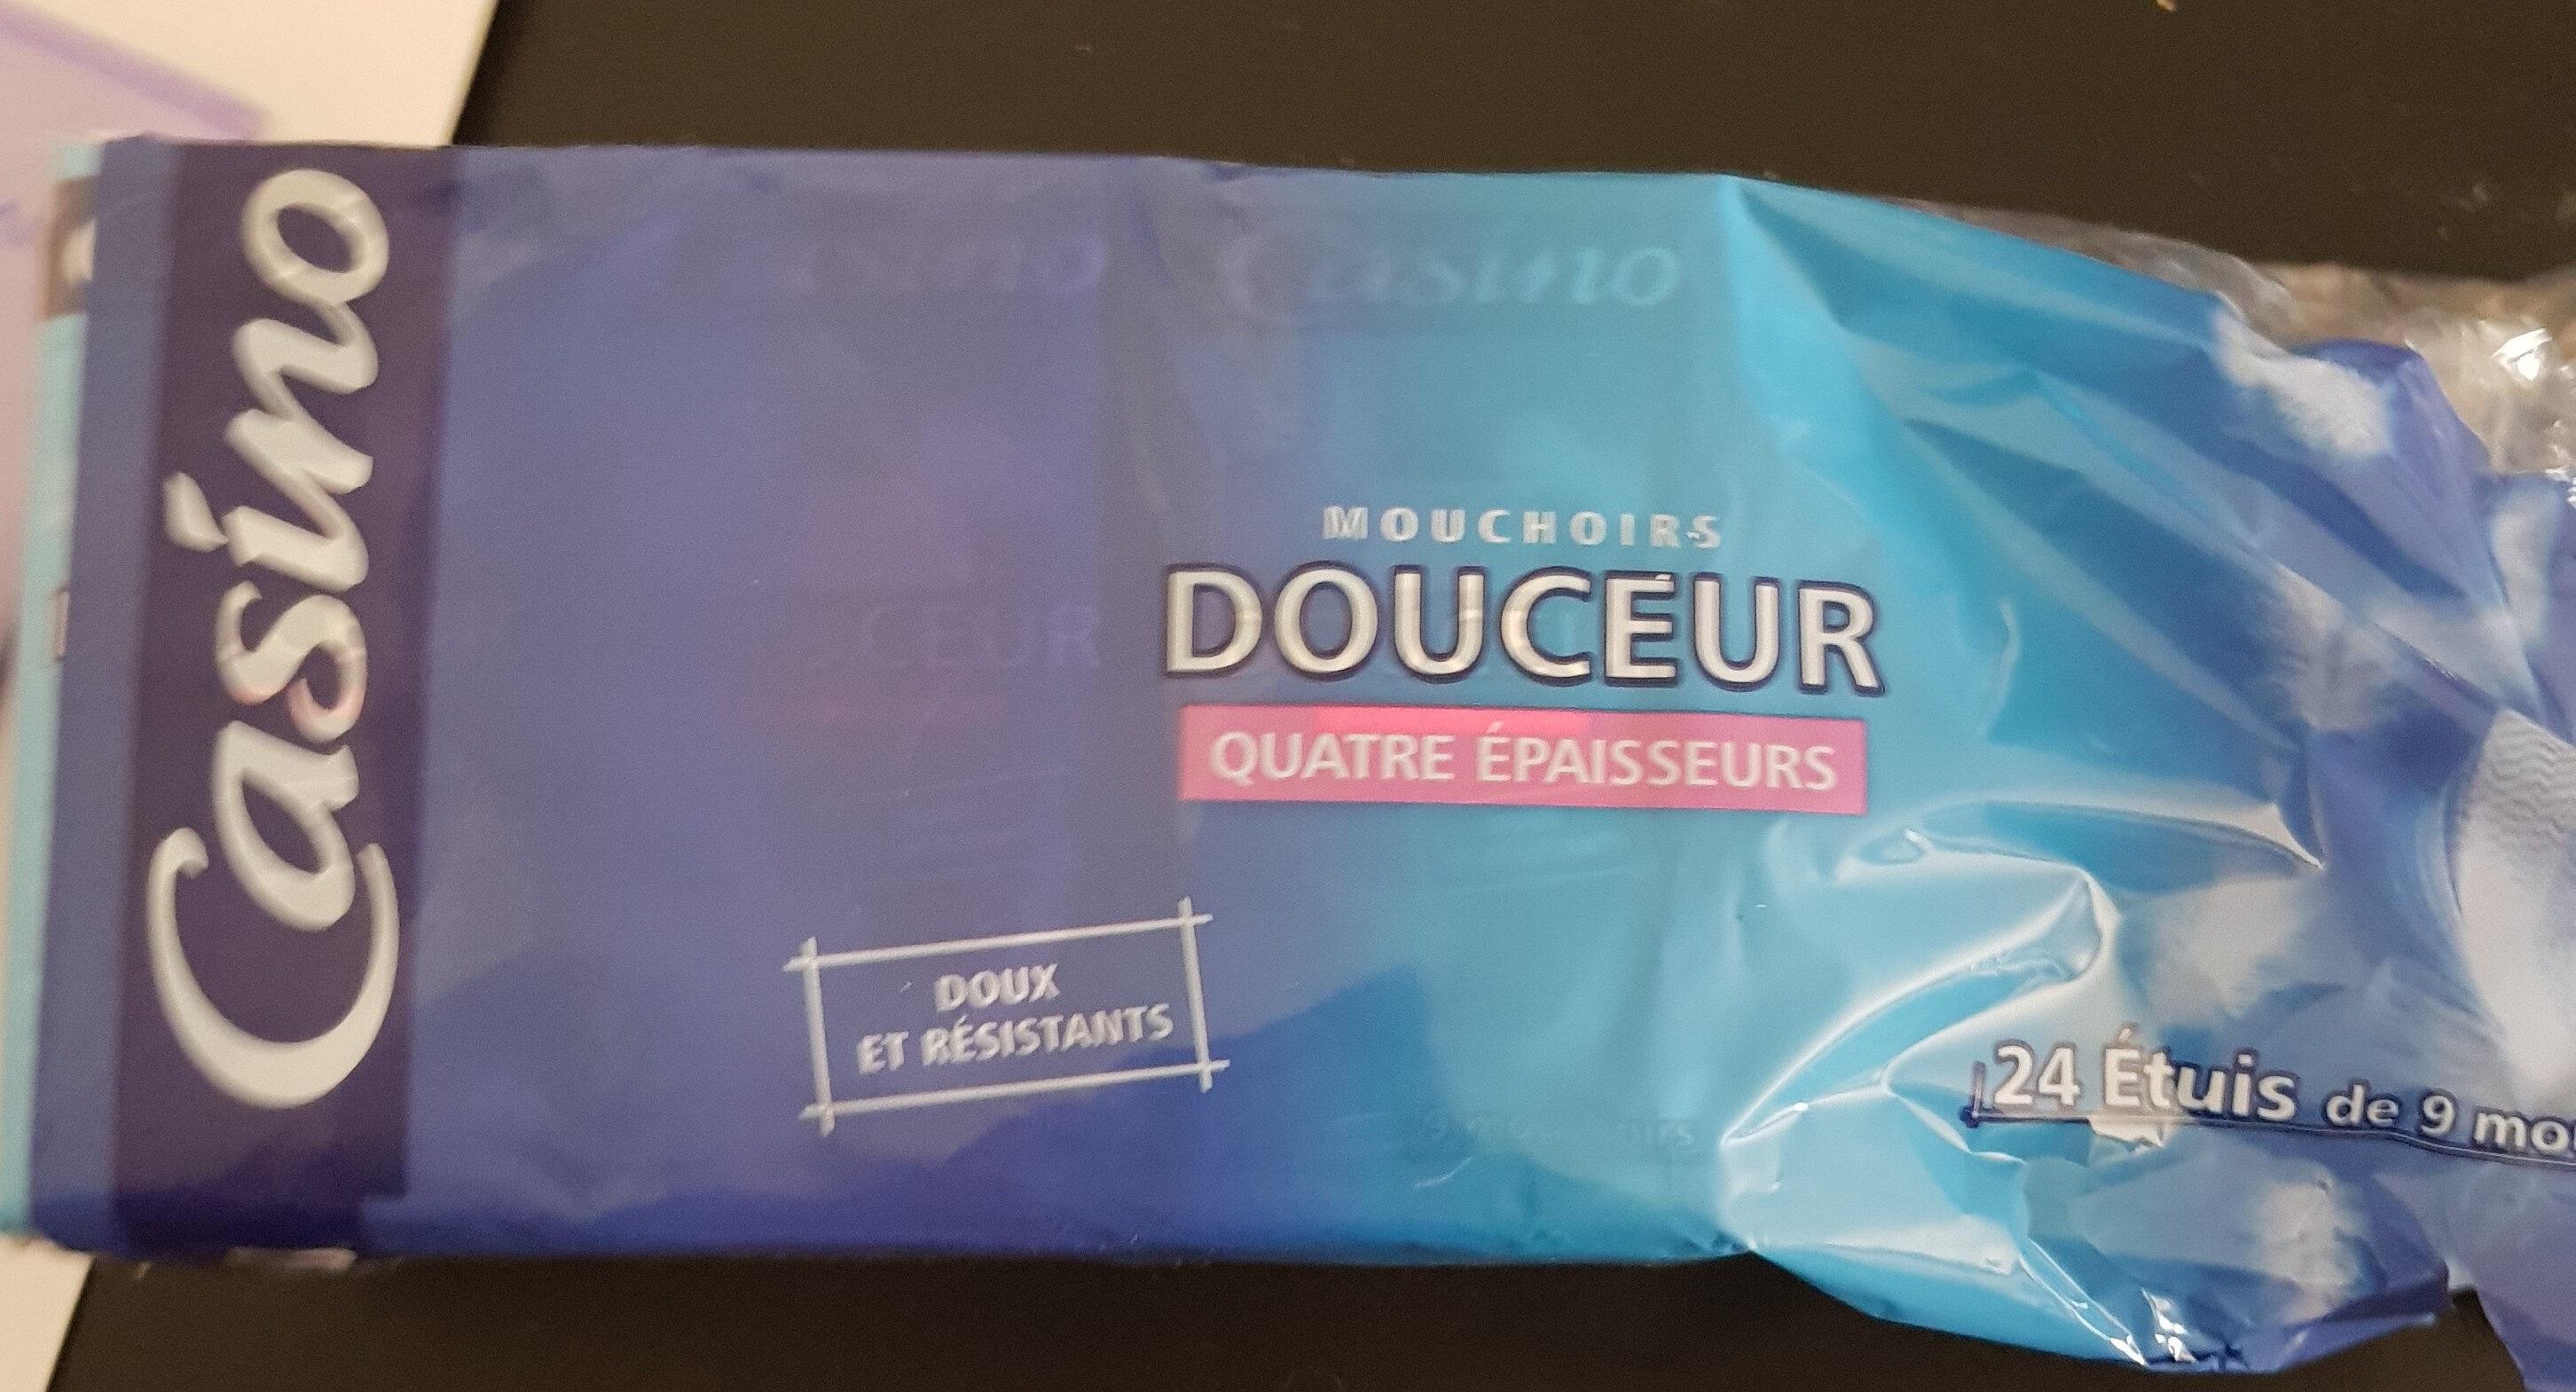 mouchoirs douceur casino - Product - fr